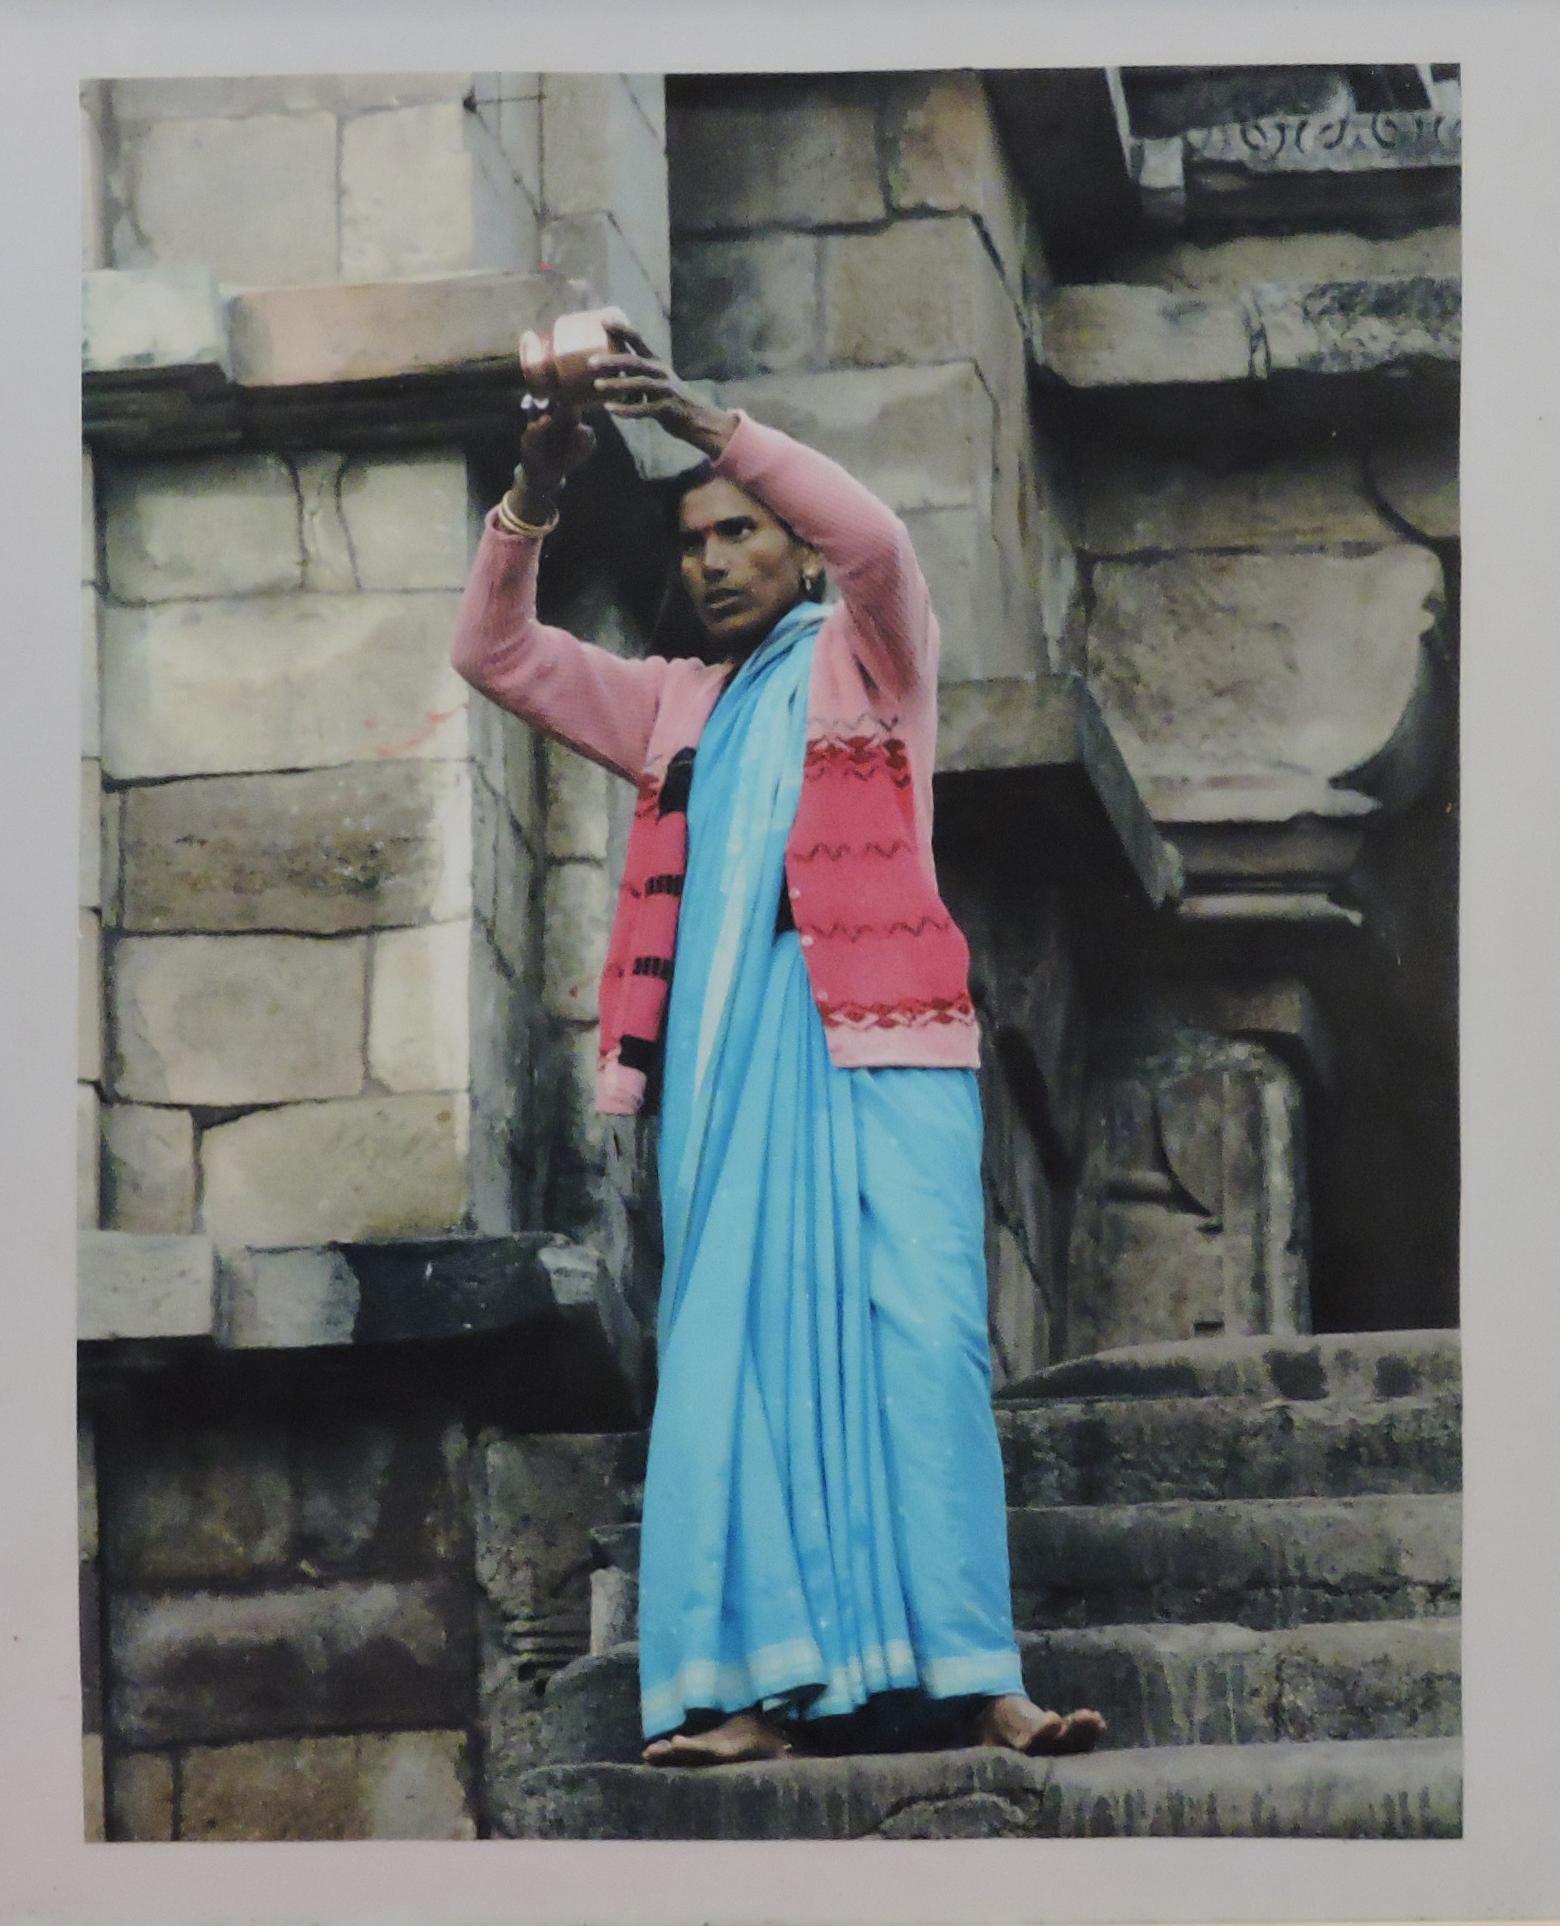 Mira_Bischoff_-_Mulher_de_azul_de_pé,_Índia,_2006._Papel_fotográfico,_40x30